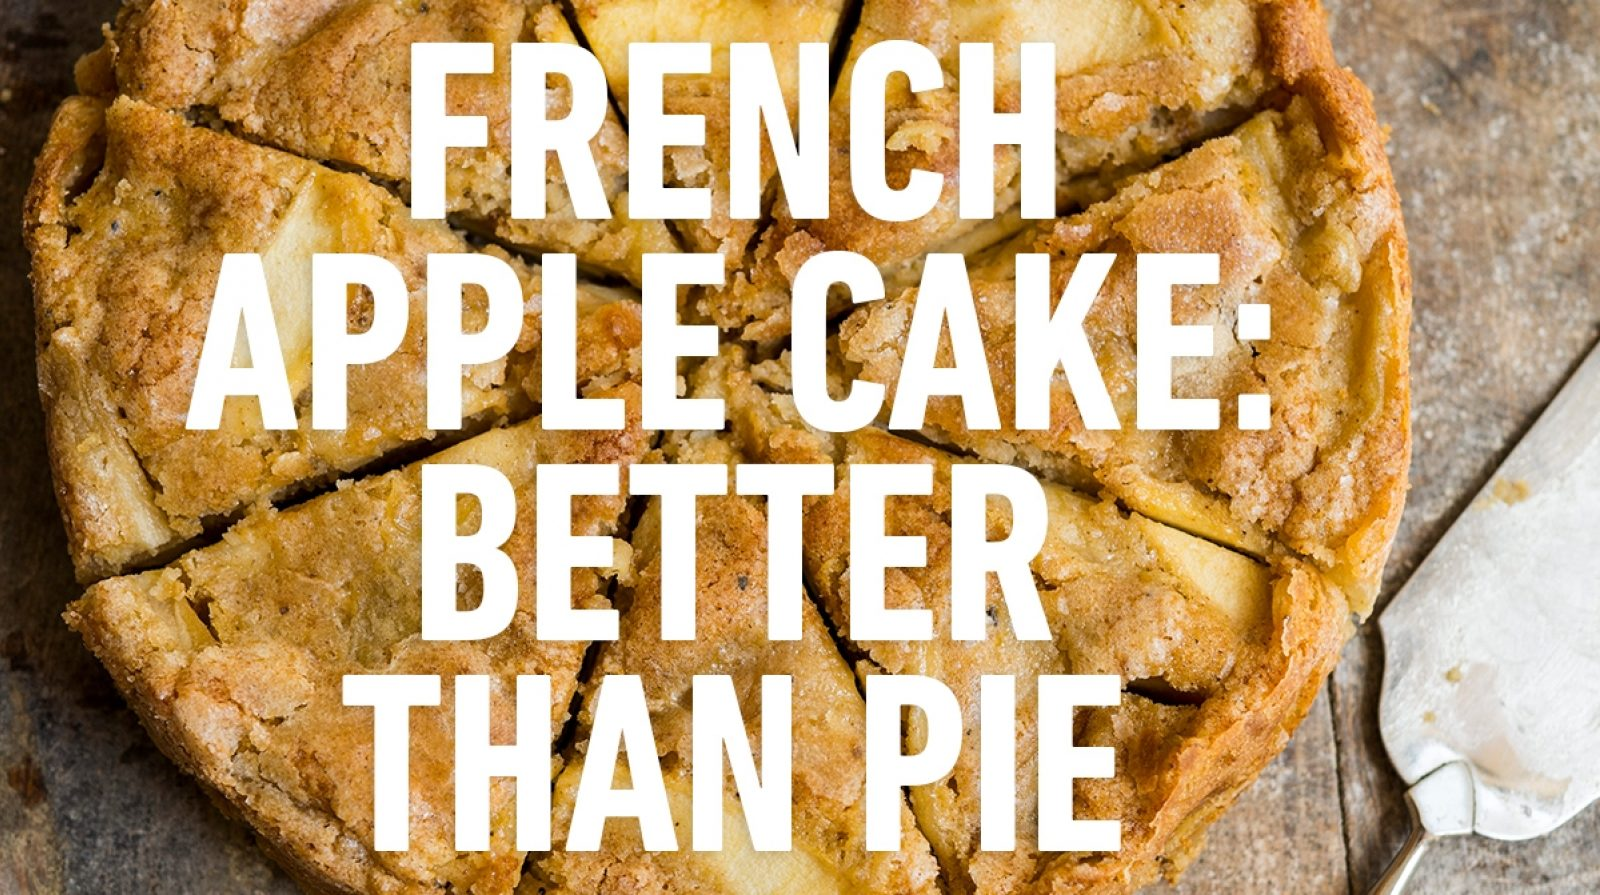 French Apple Cake Milk Street